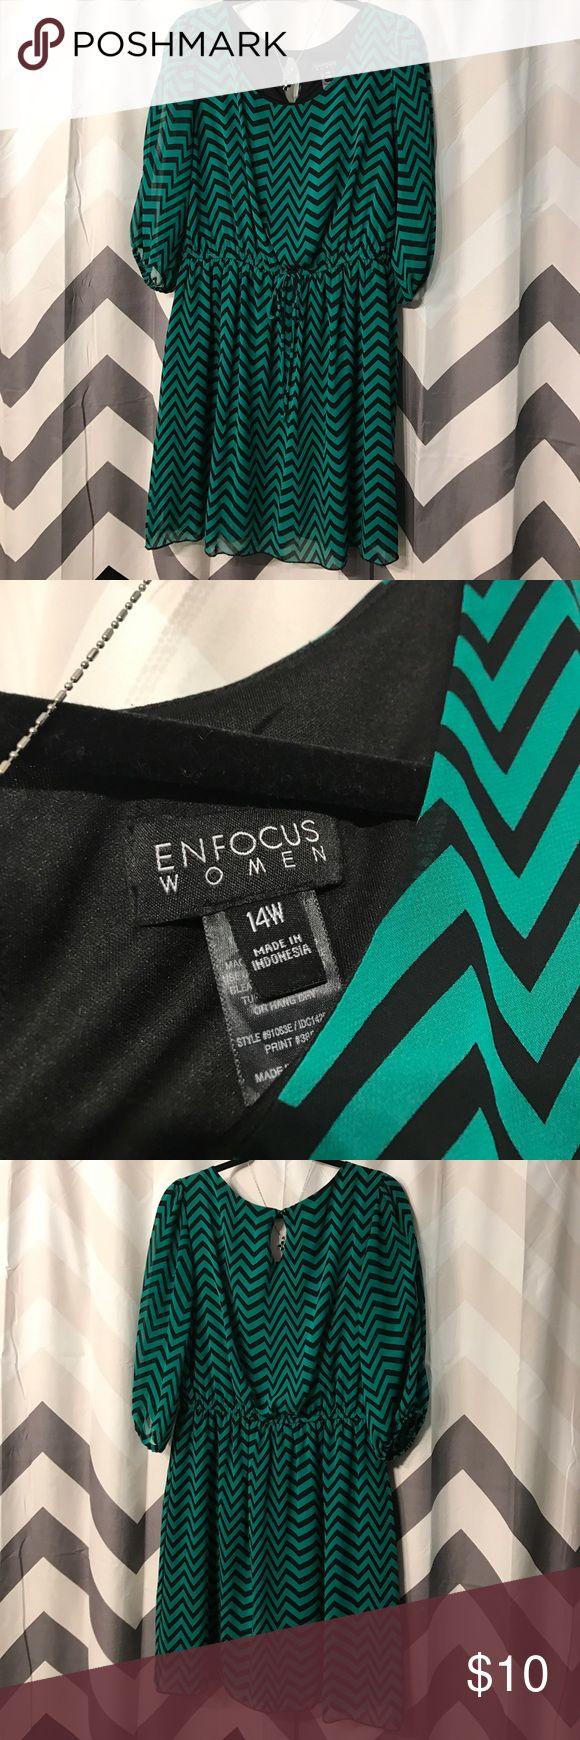 Cute chevron print dress size 14w Green/black chevron print dress with sheer sleeves Enfocus Women Dresses